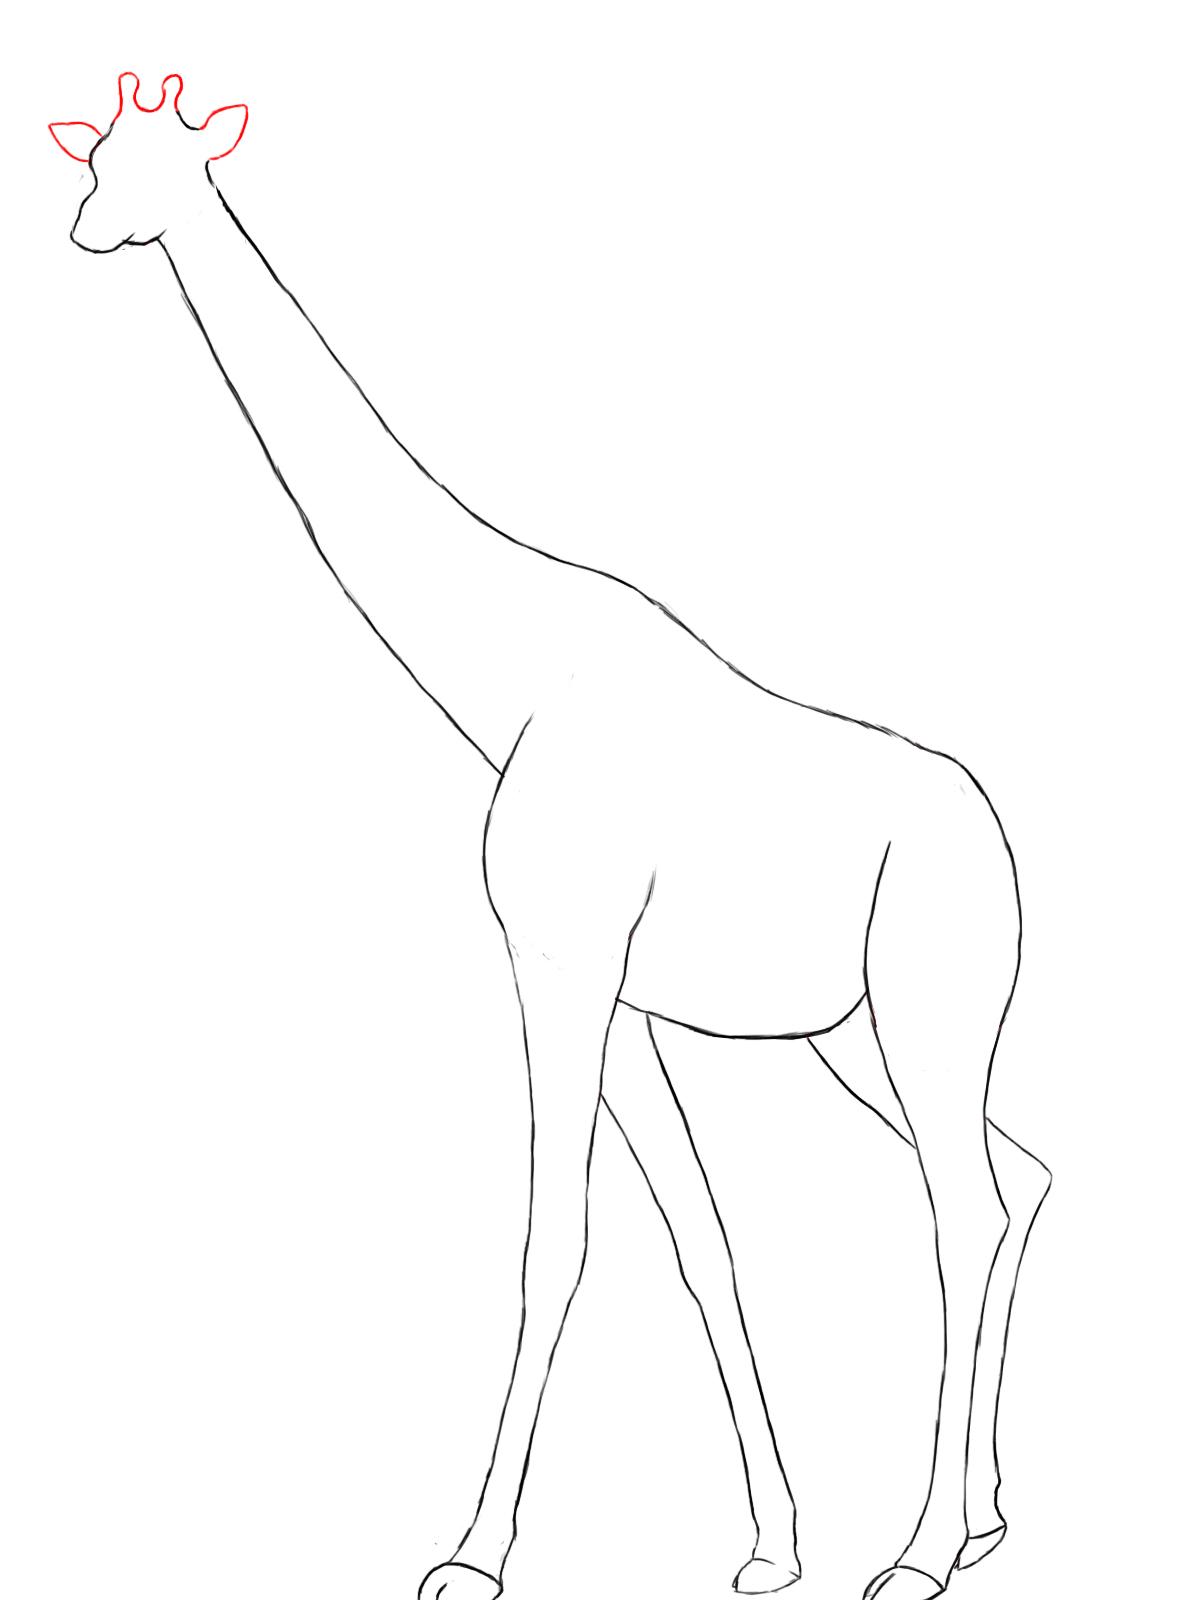 Line Drawing Giraffe : How to draw a giraffe central